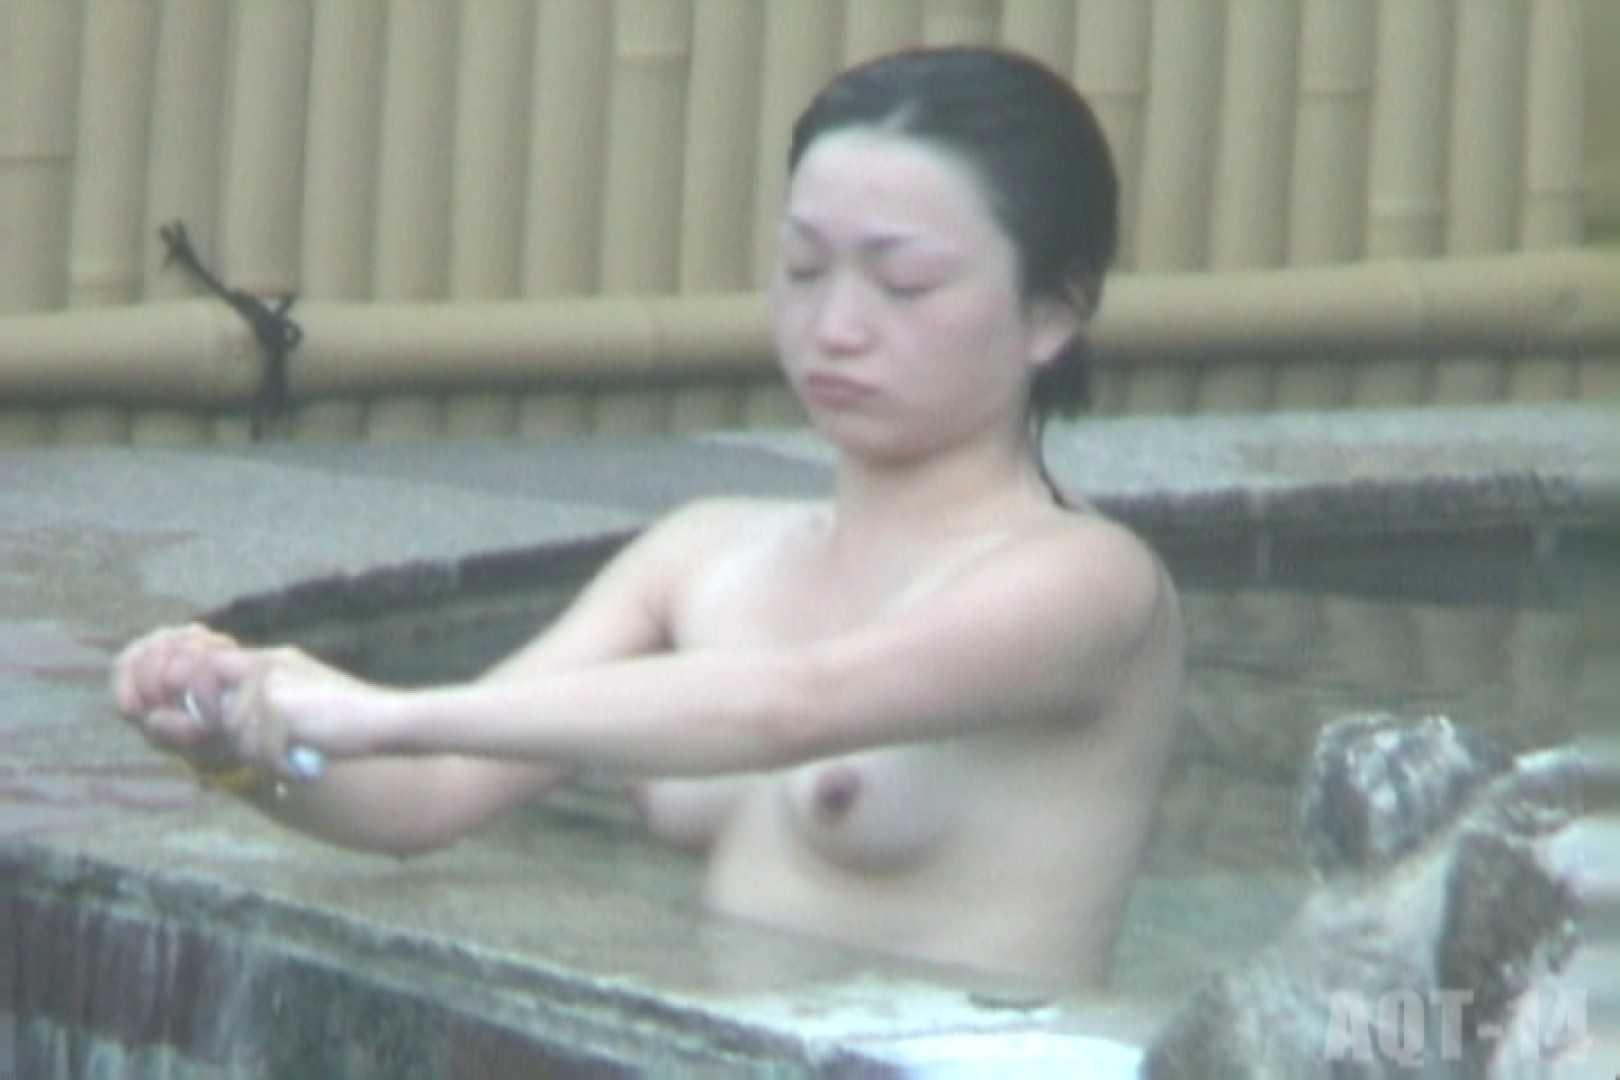 Aquaな露天風呂Vol.826 盗撮  84連発 9